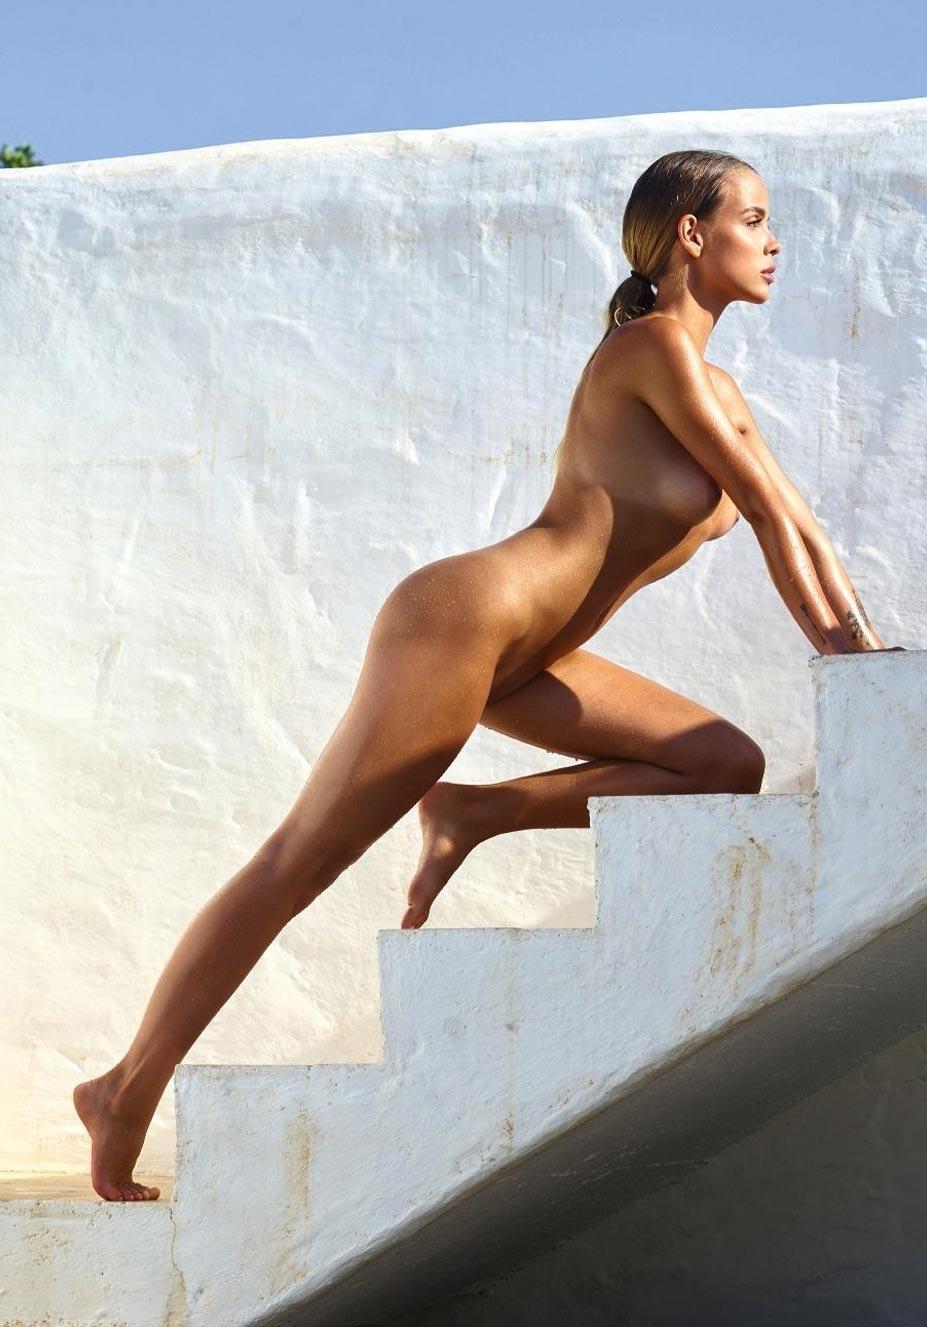 Тэйлор Брюманн - Девушка месяца Playboy Германия в мае 2021 / фото 07